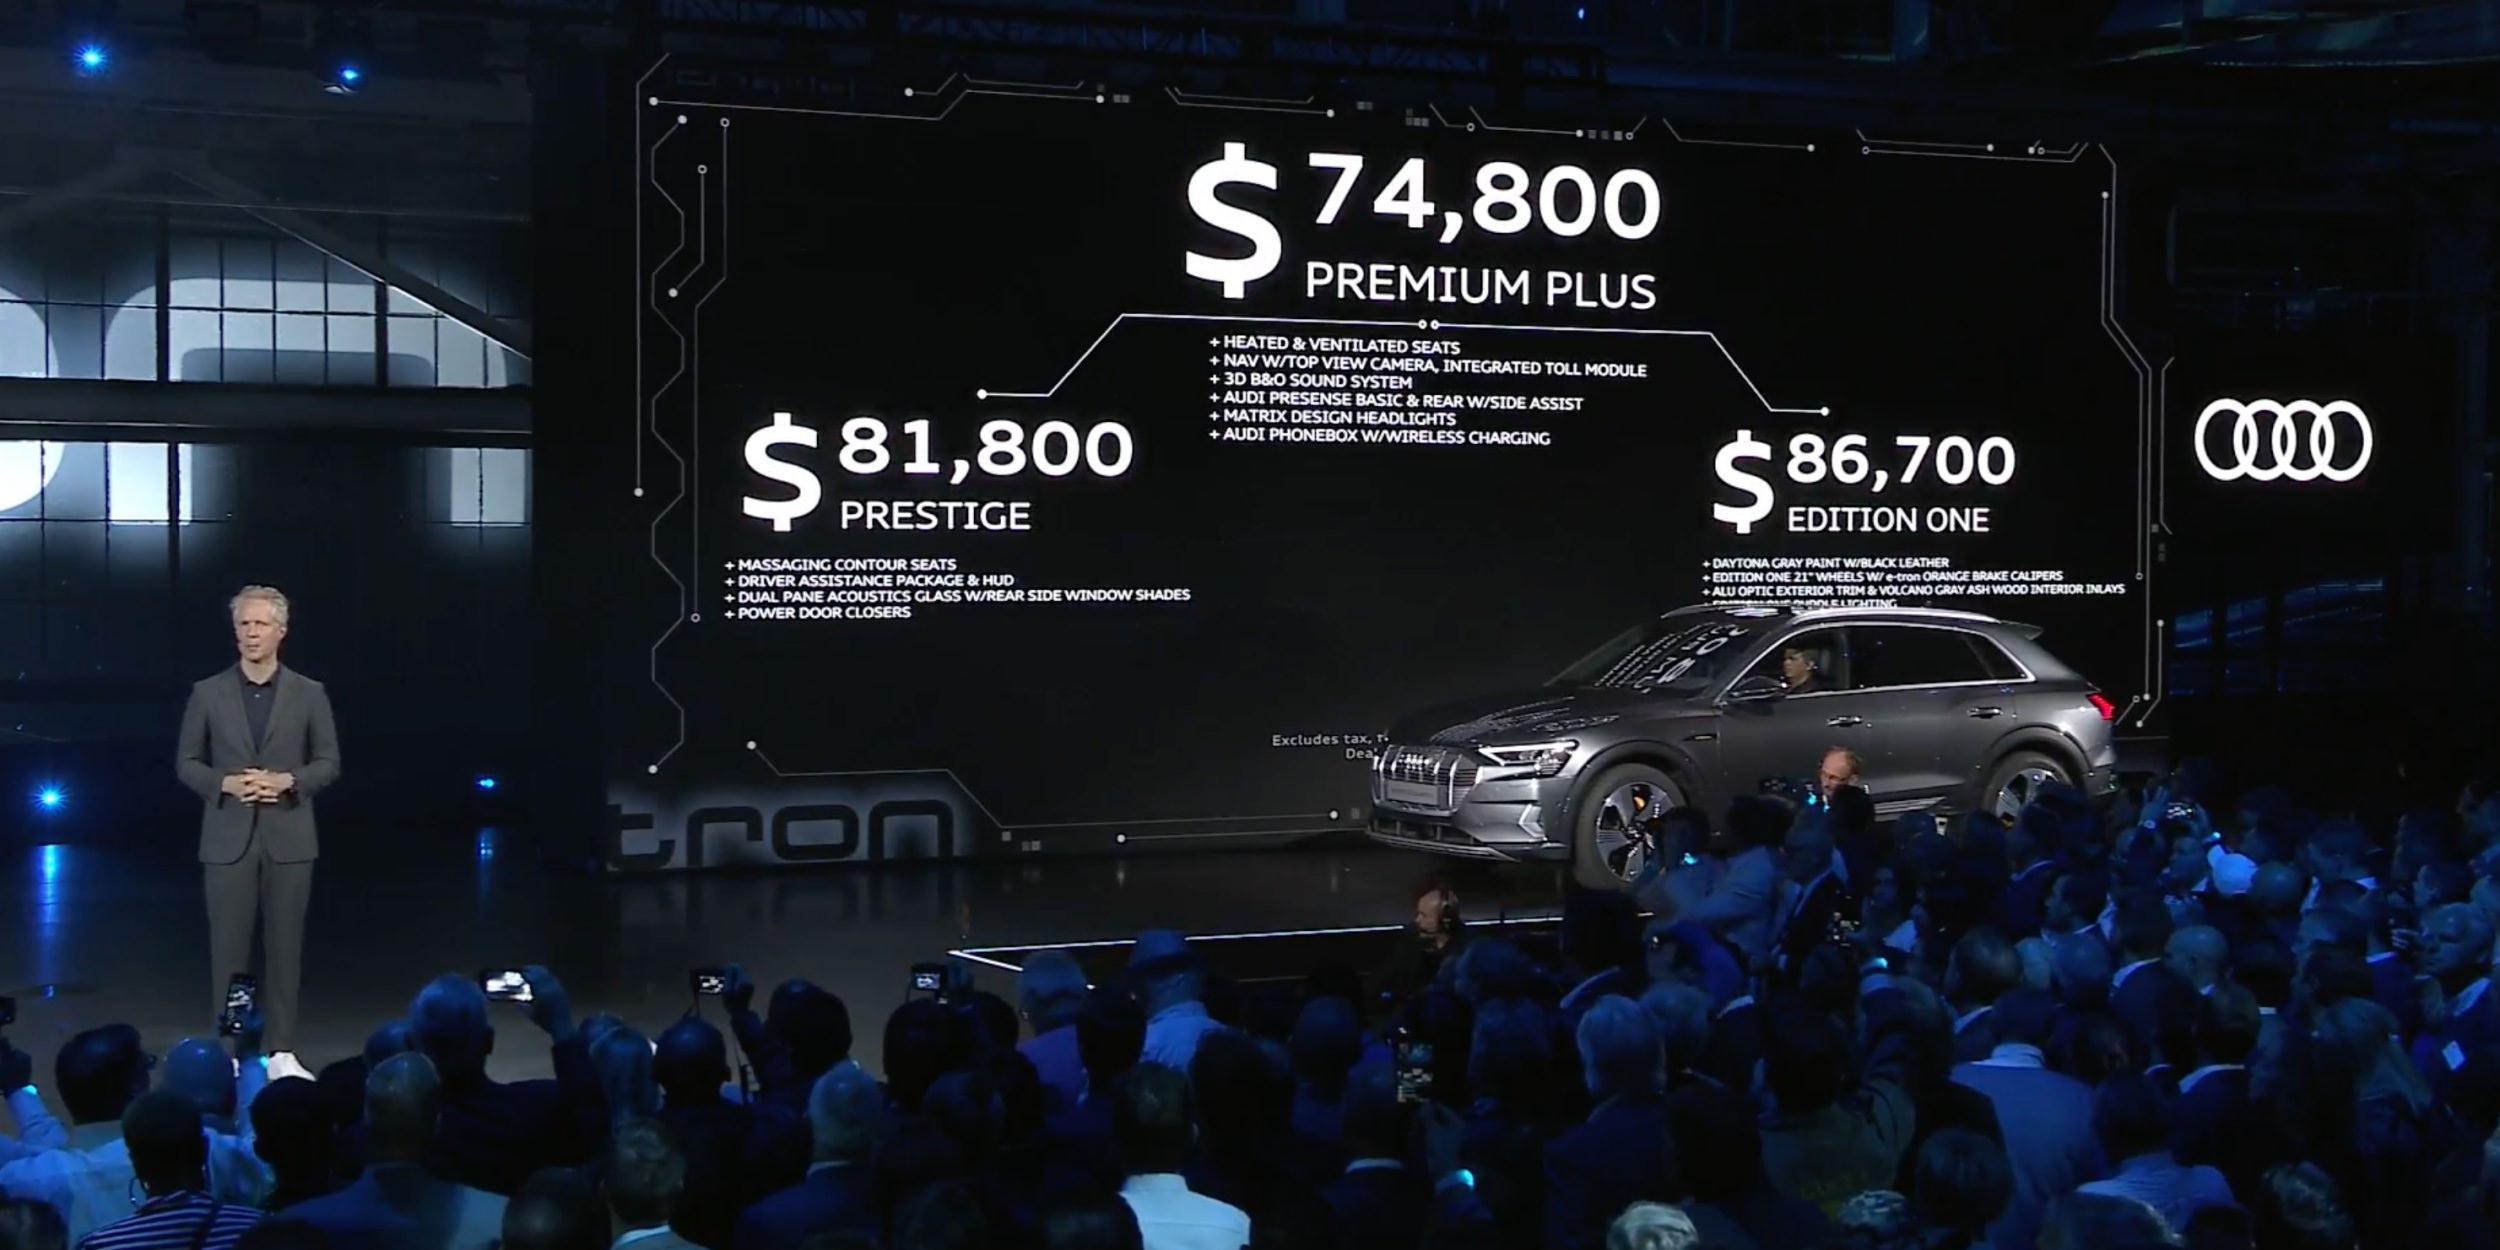 Audi E-Tron World Launch pricing